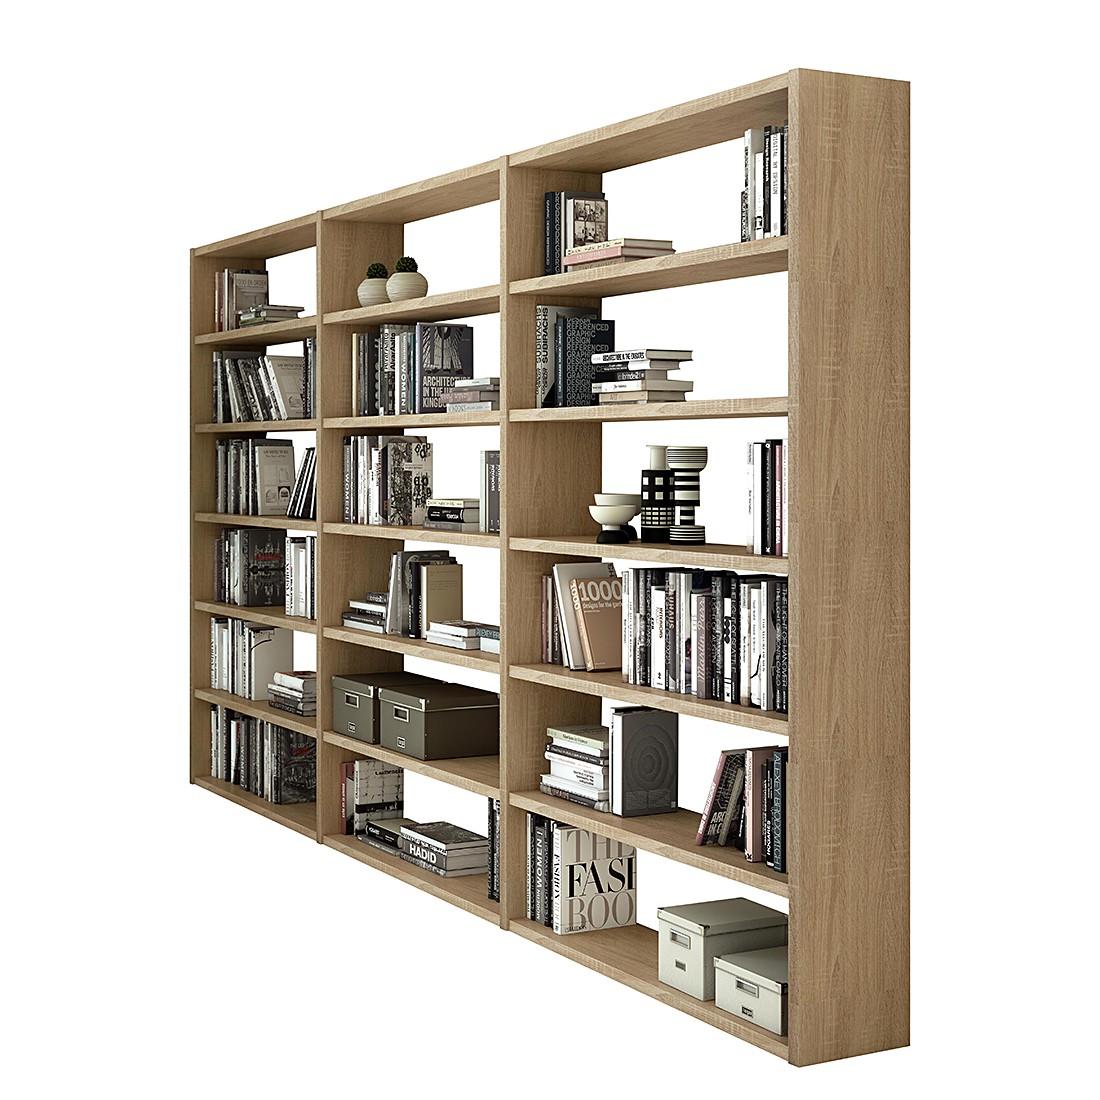 Bibliothèque Empire - Imitation chêne de Sonoma, Fredriks